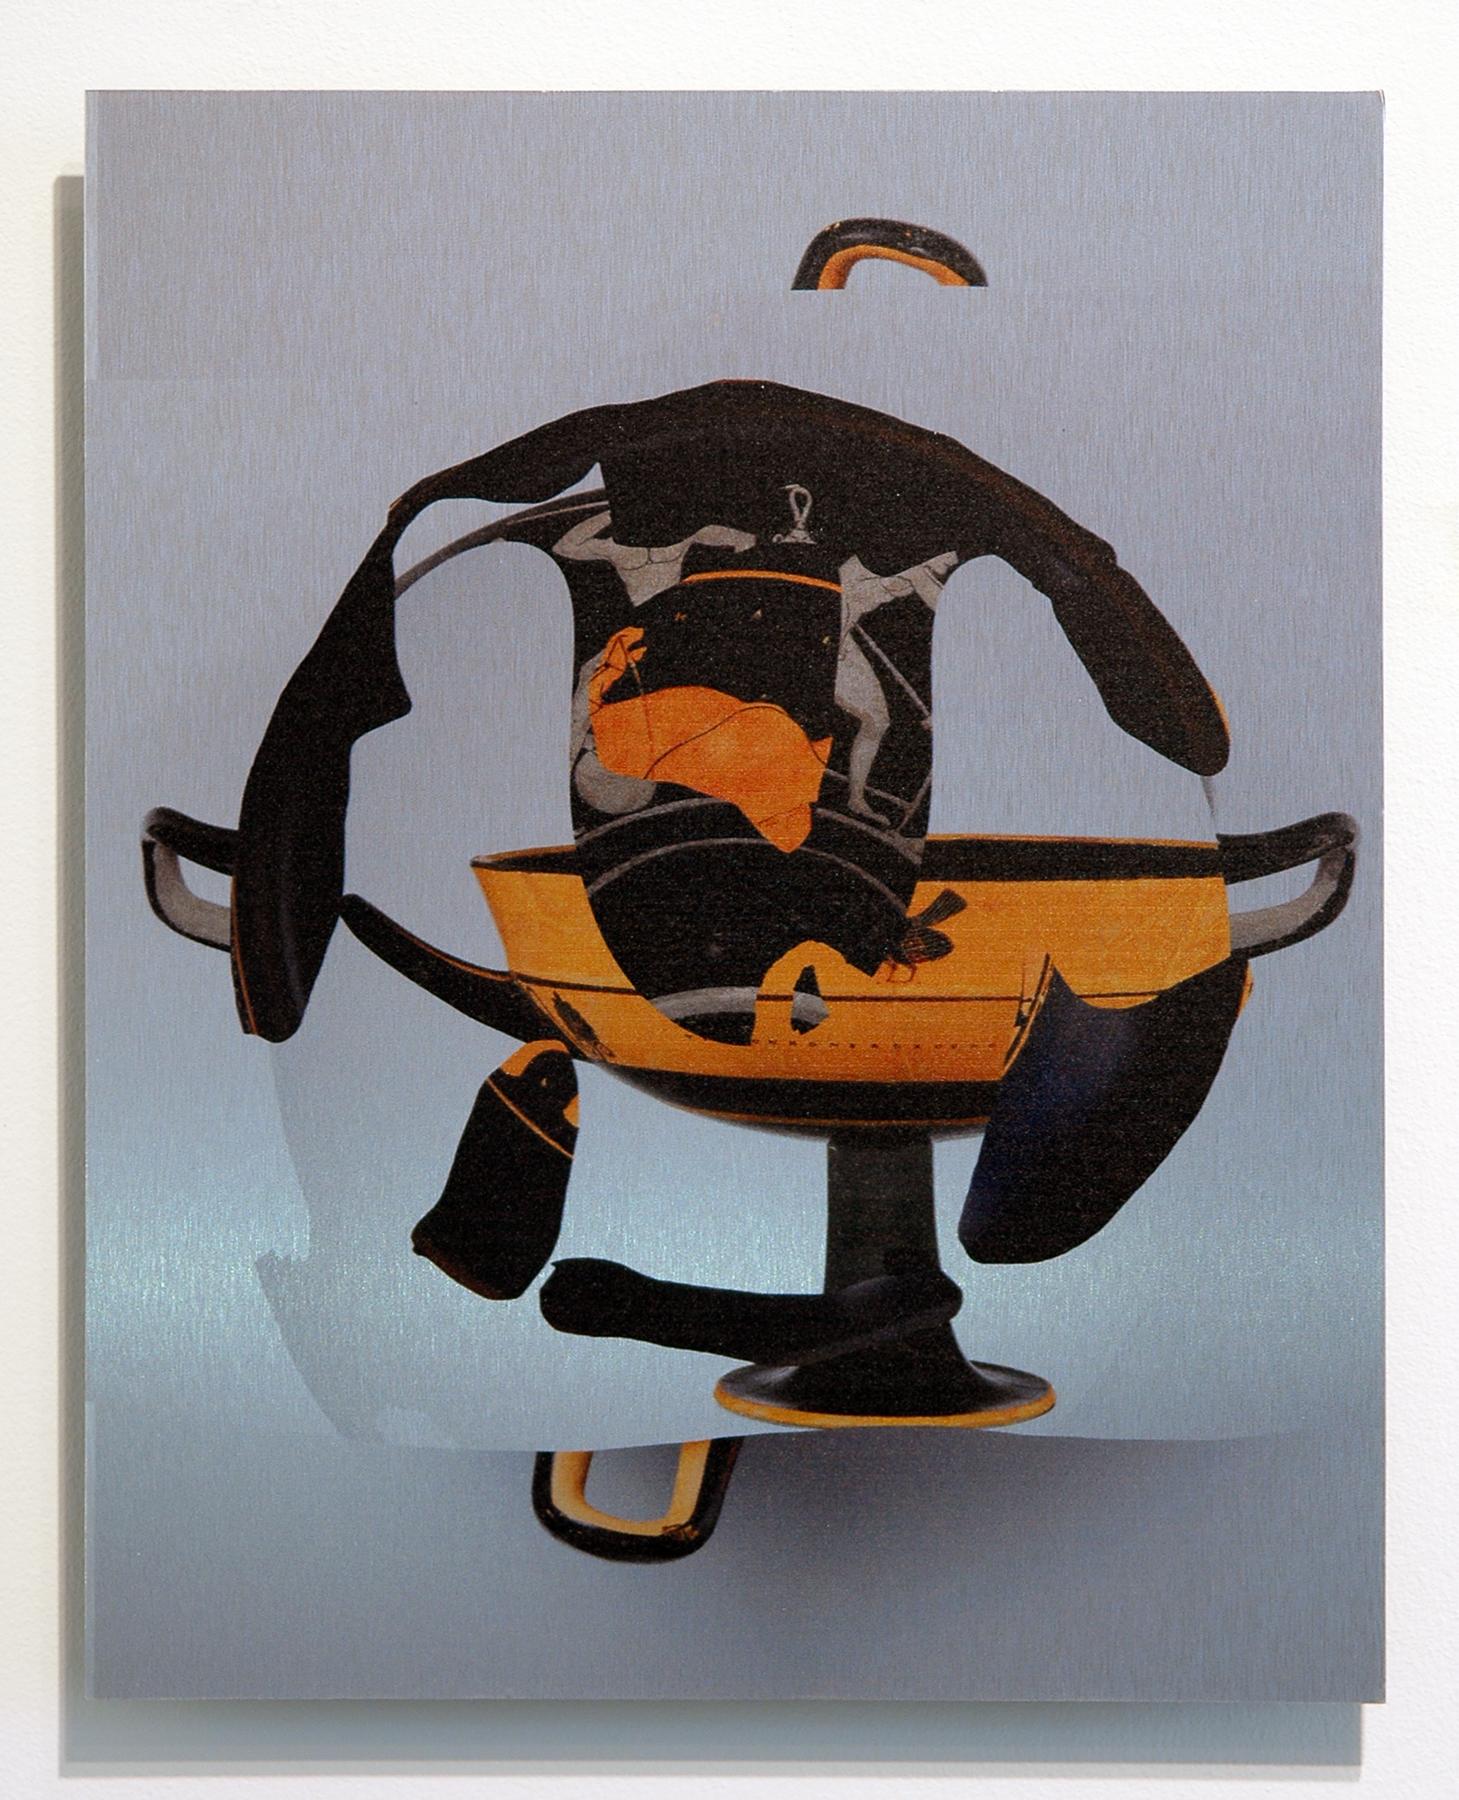 "WITH CINDER BLOCKS WE FLATTEN OUR PHOTOGRAPHS  Deric Carner, Kylix , pigment print on brushed aluminum, unique, 15"" x 12"", 2013"